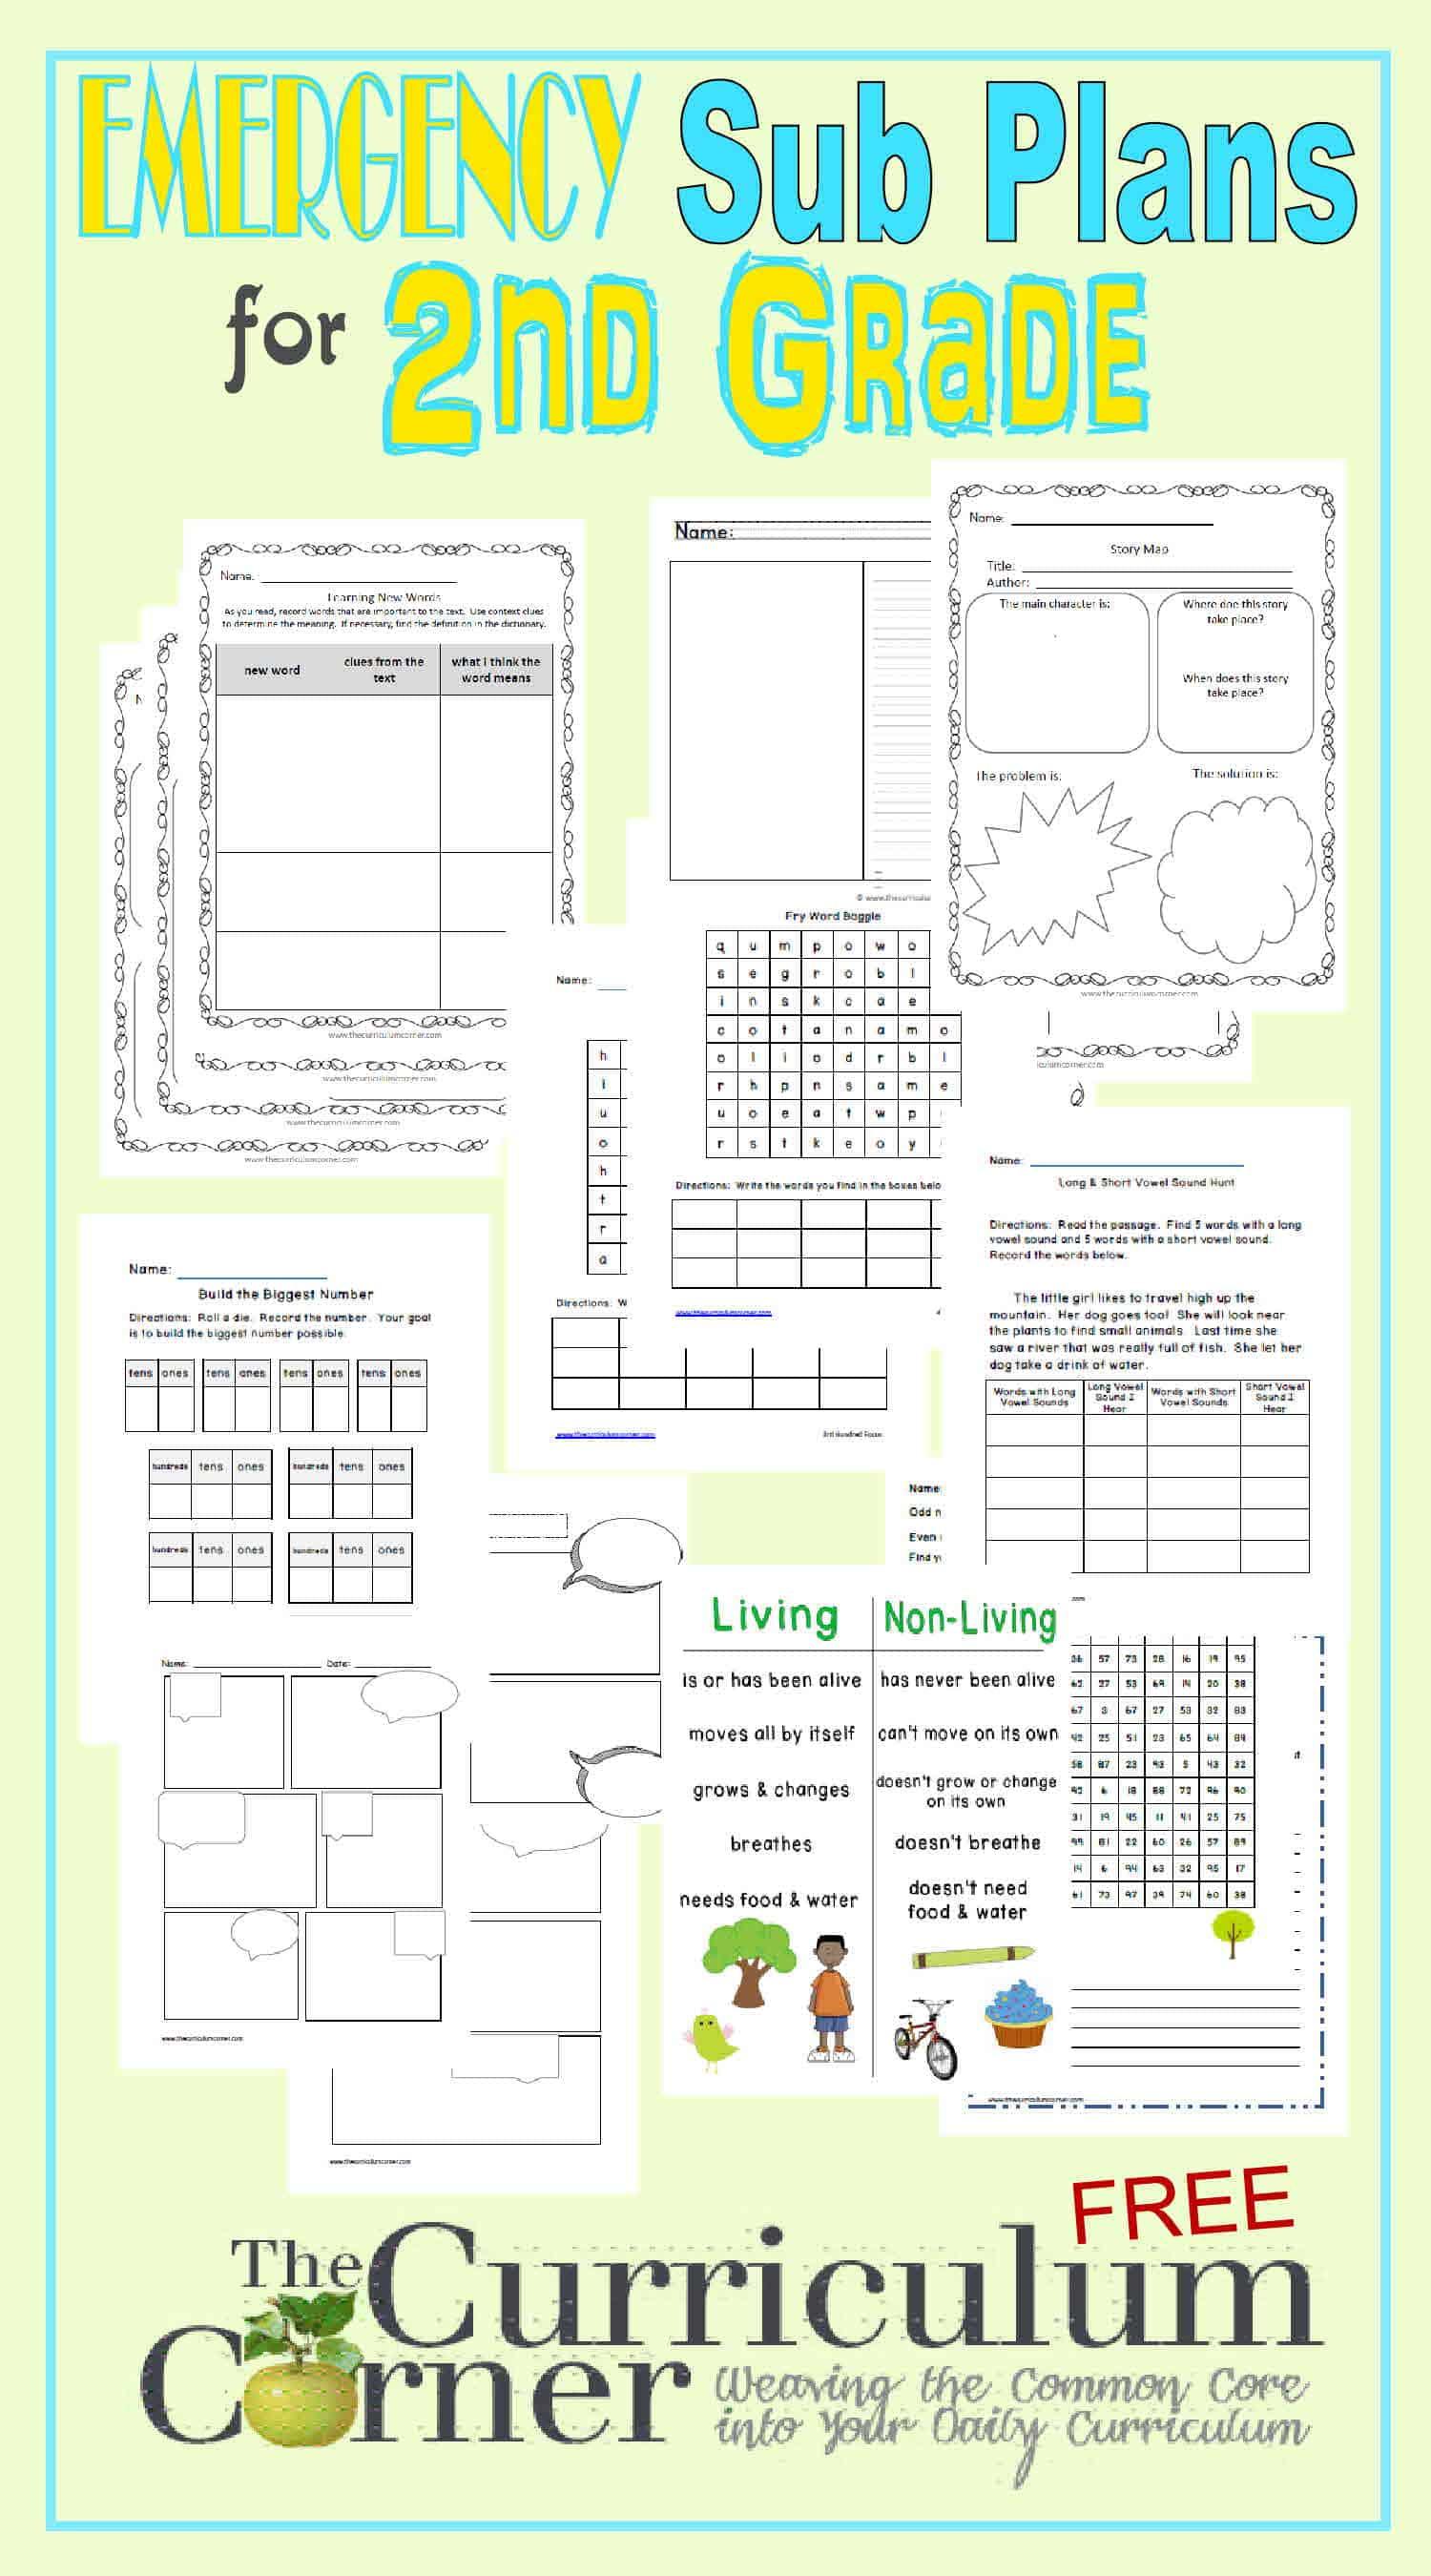 medium resolution of 2nd Grade Emergency Sub Plans - The Curriculum Corner 123